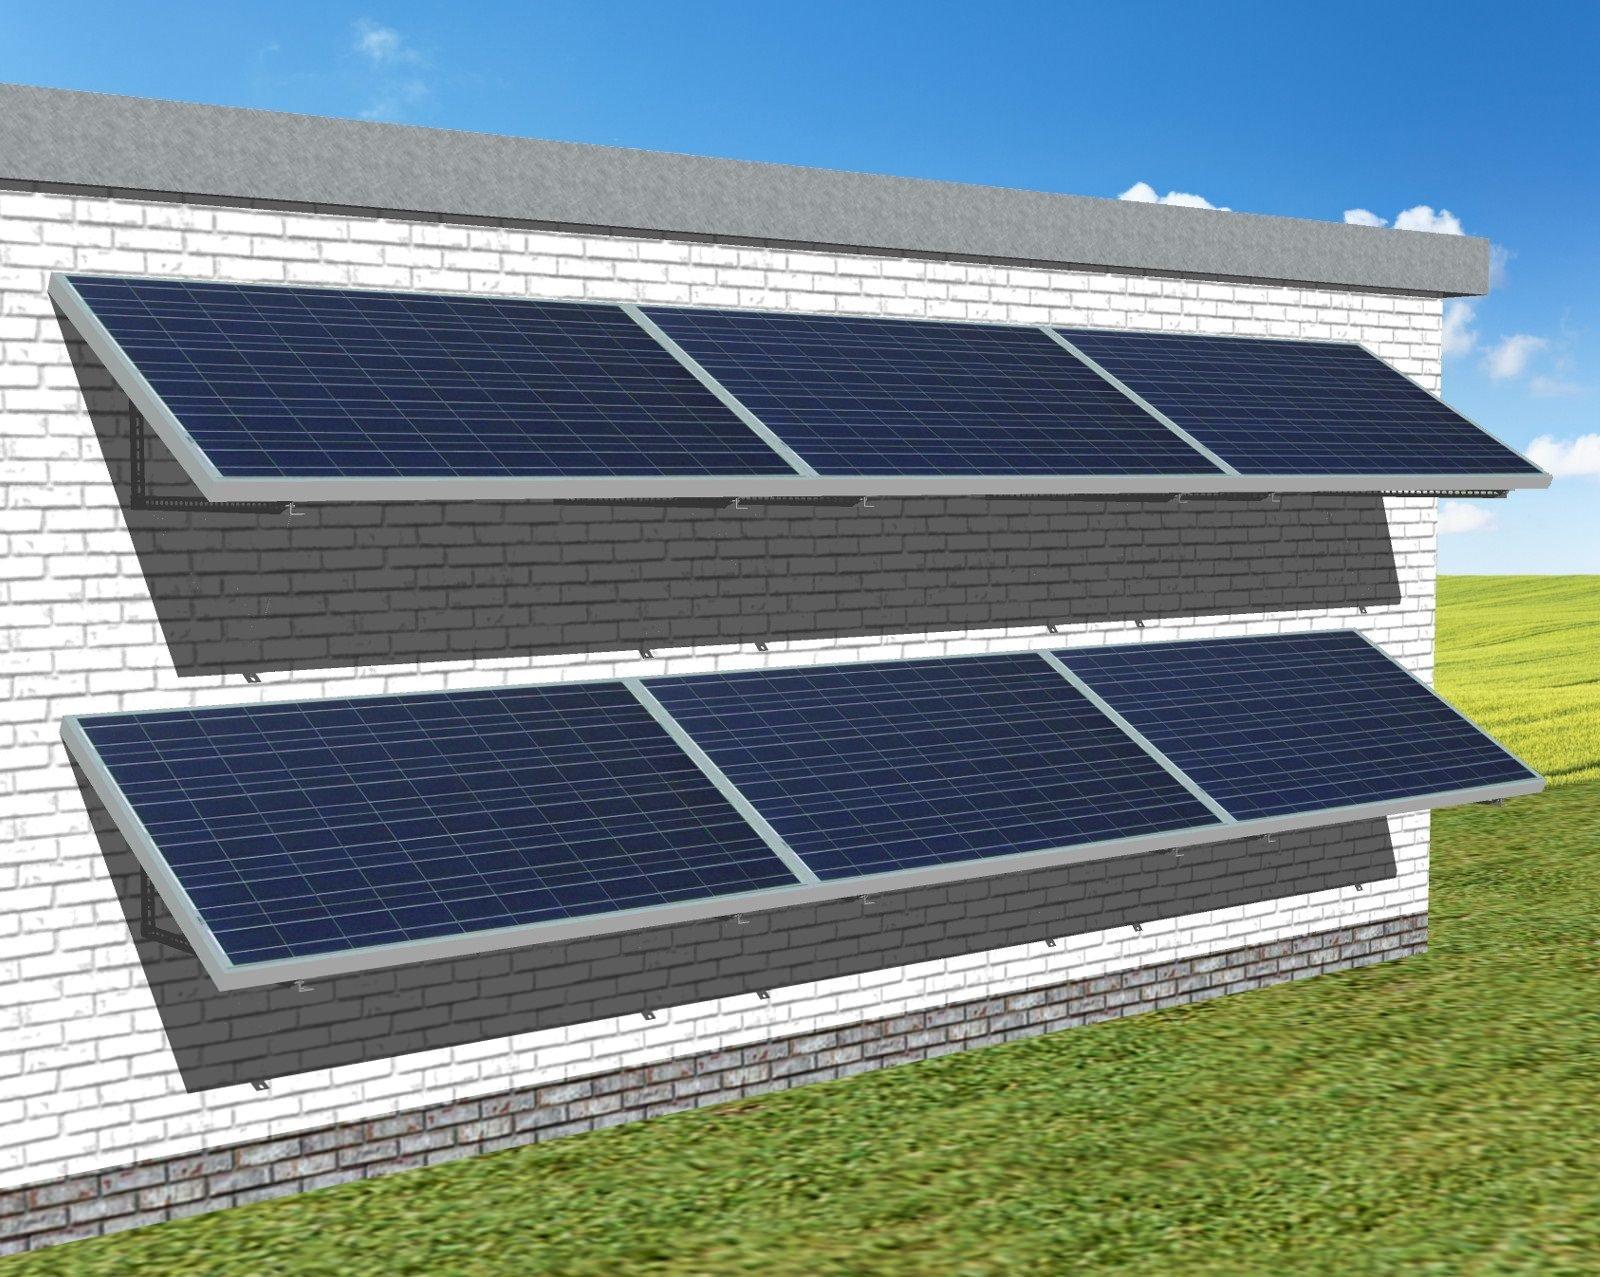 myCleantech-Solar.org Solaranalage Fassade oder Carport mit 6 Pannels